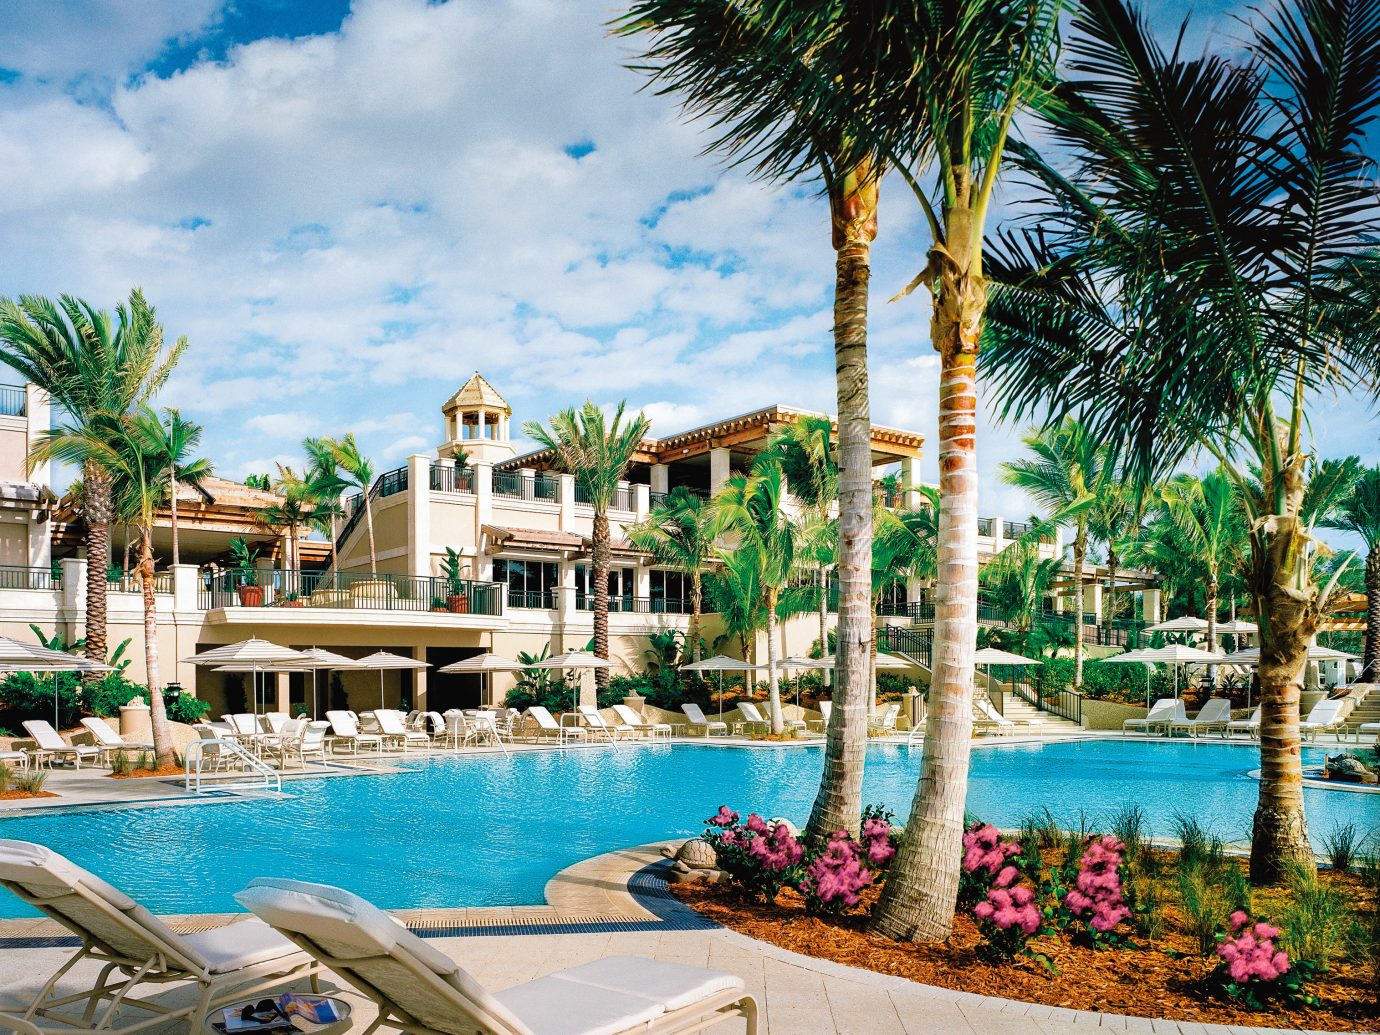 Ritz-Carlton Sarasota